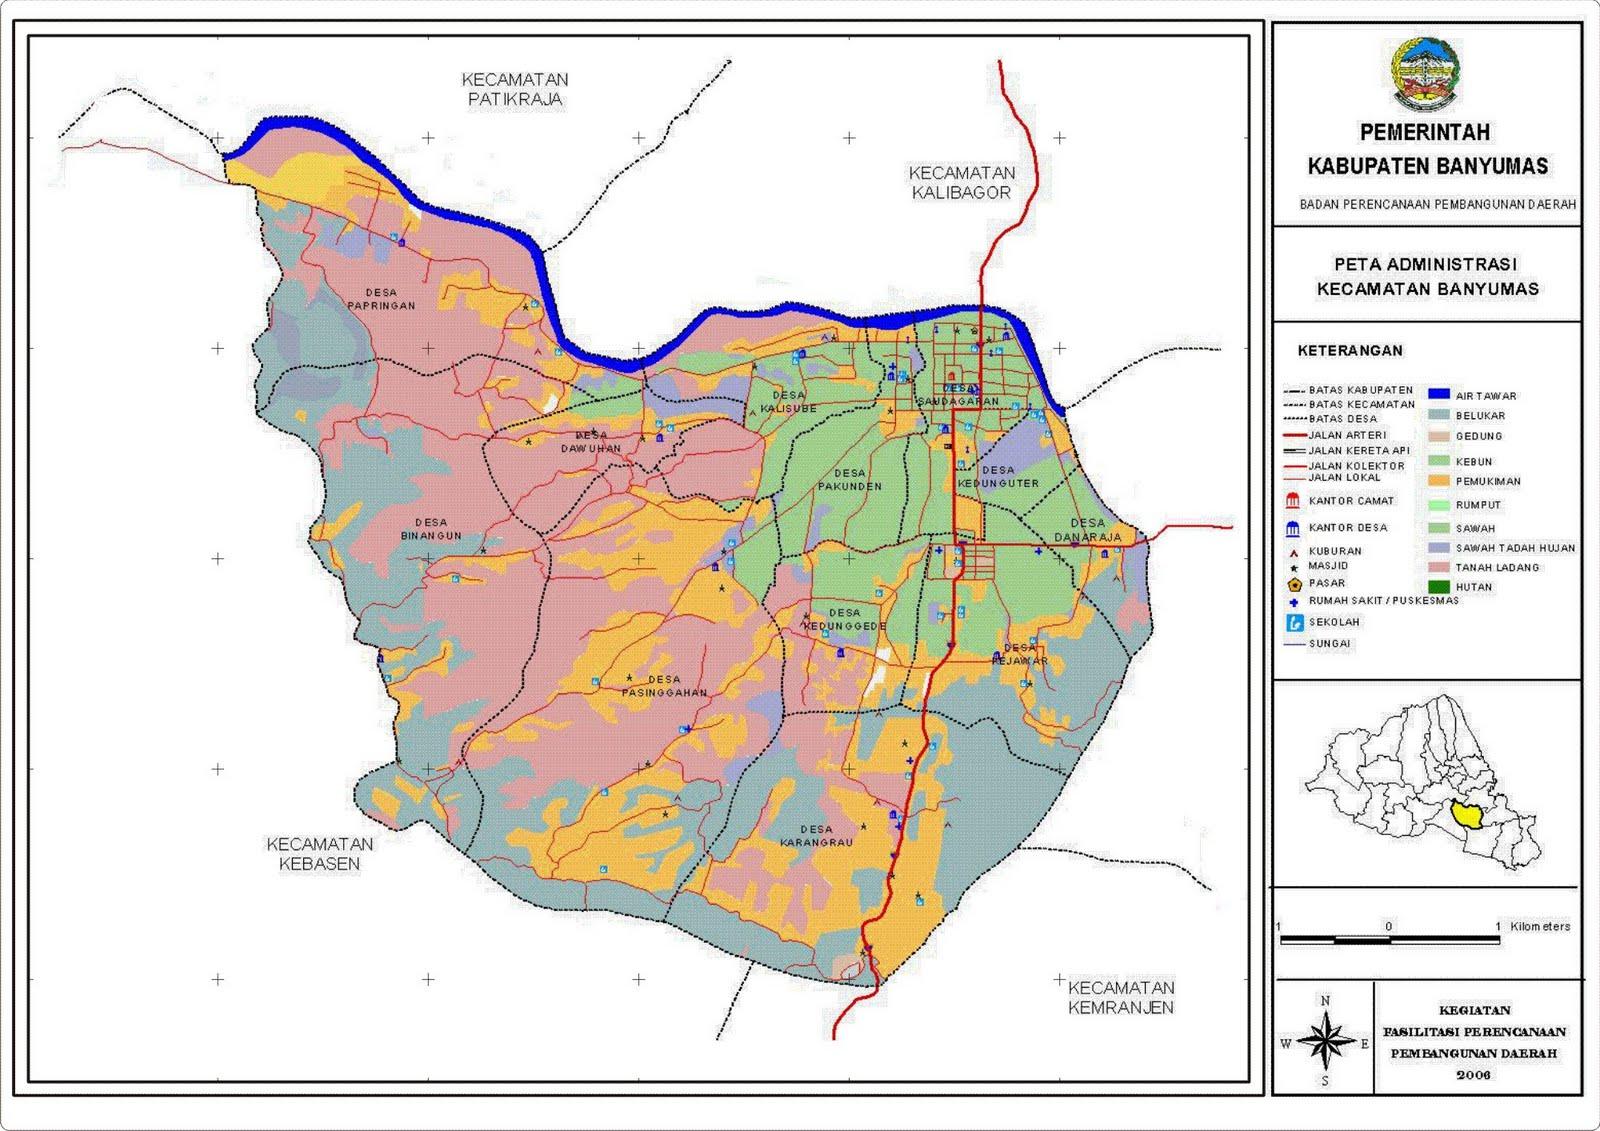 Gambar Peta Jalan Kota Purwokerto | Ask Home Design